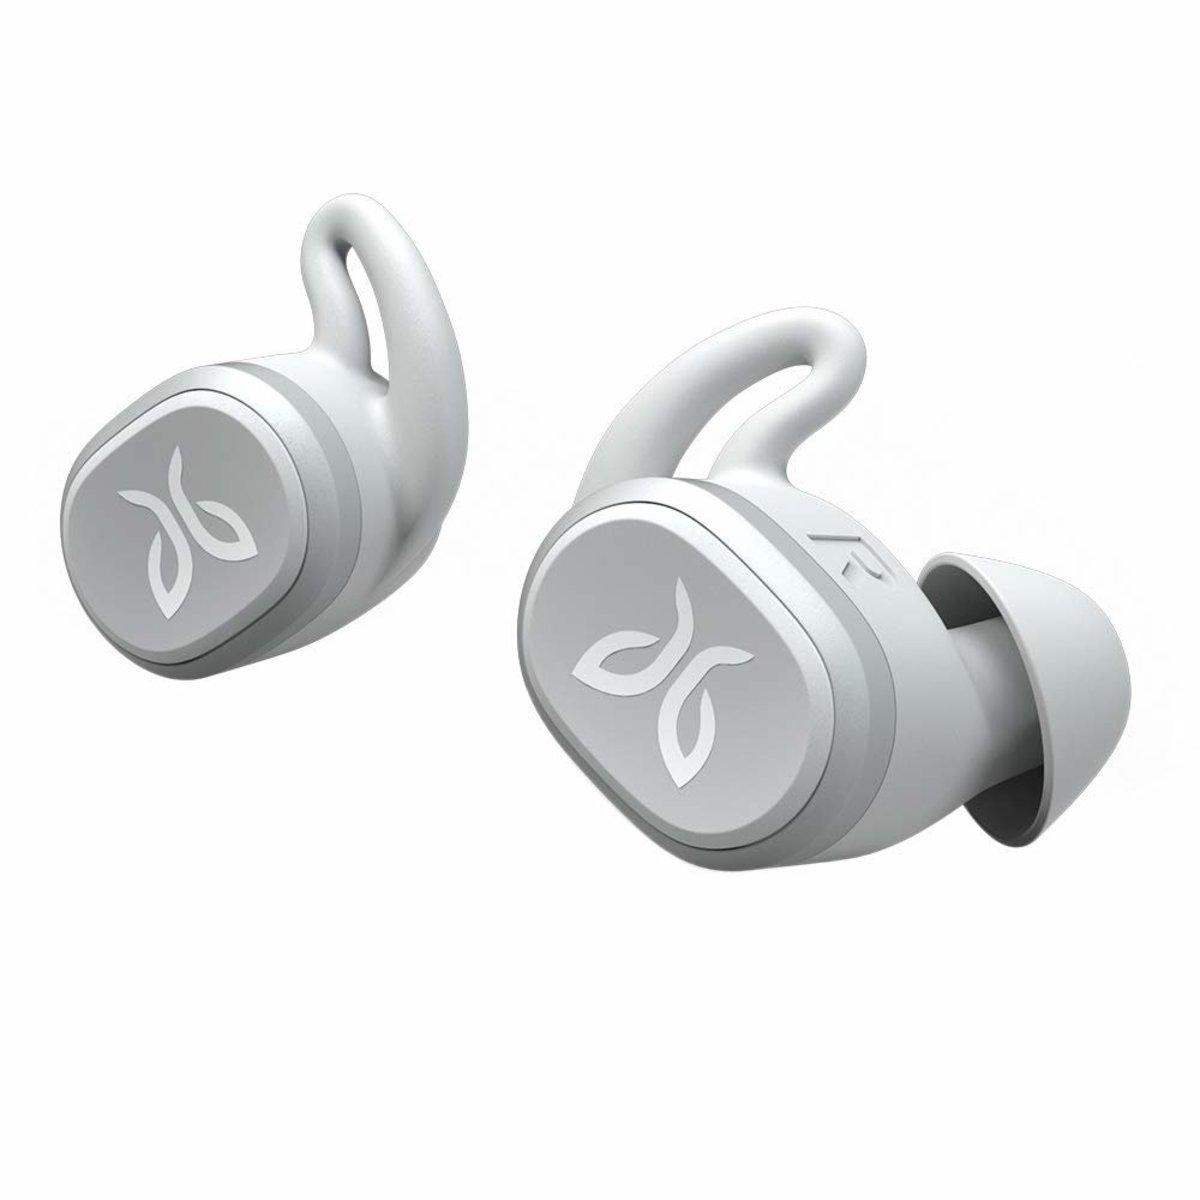 Vista 藍牙5.0真無線 IPX7防水運動耳機[淺灰色]